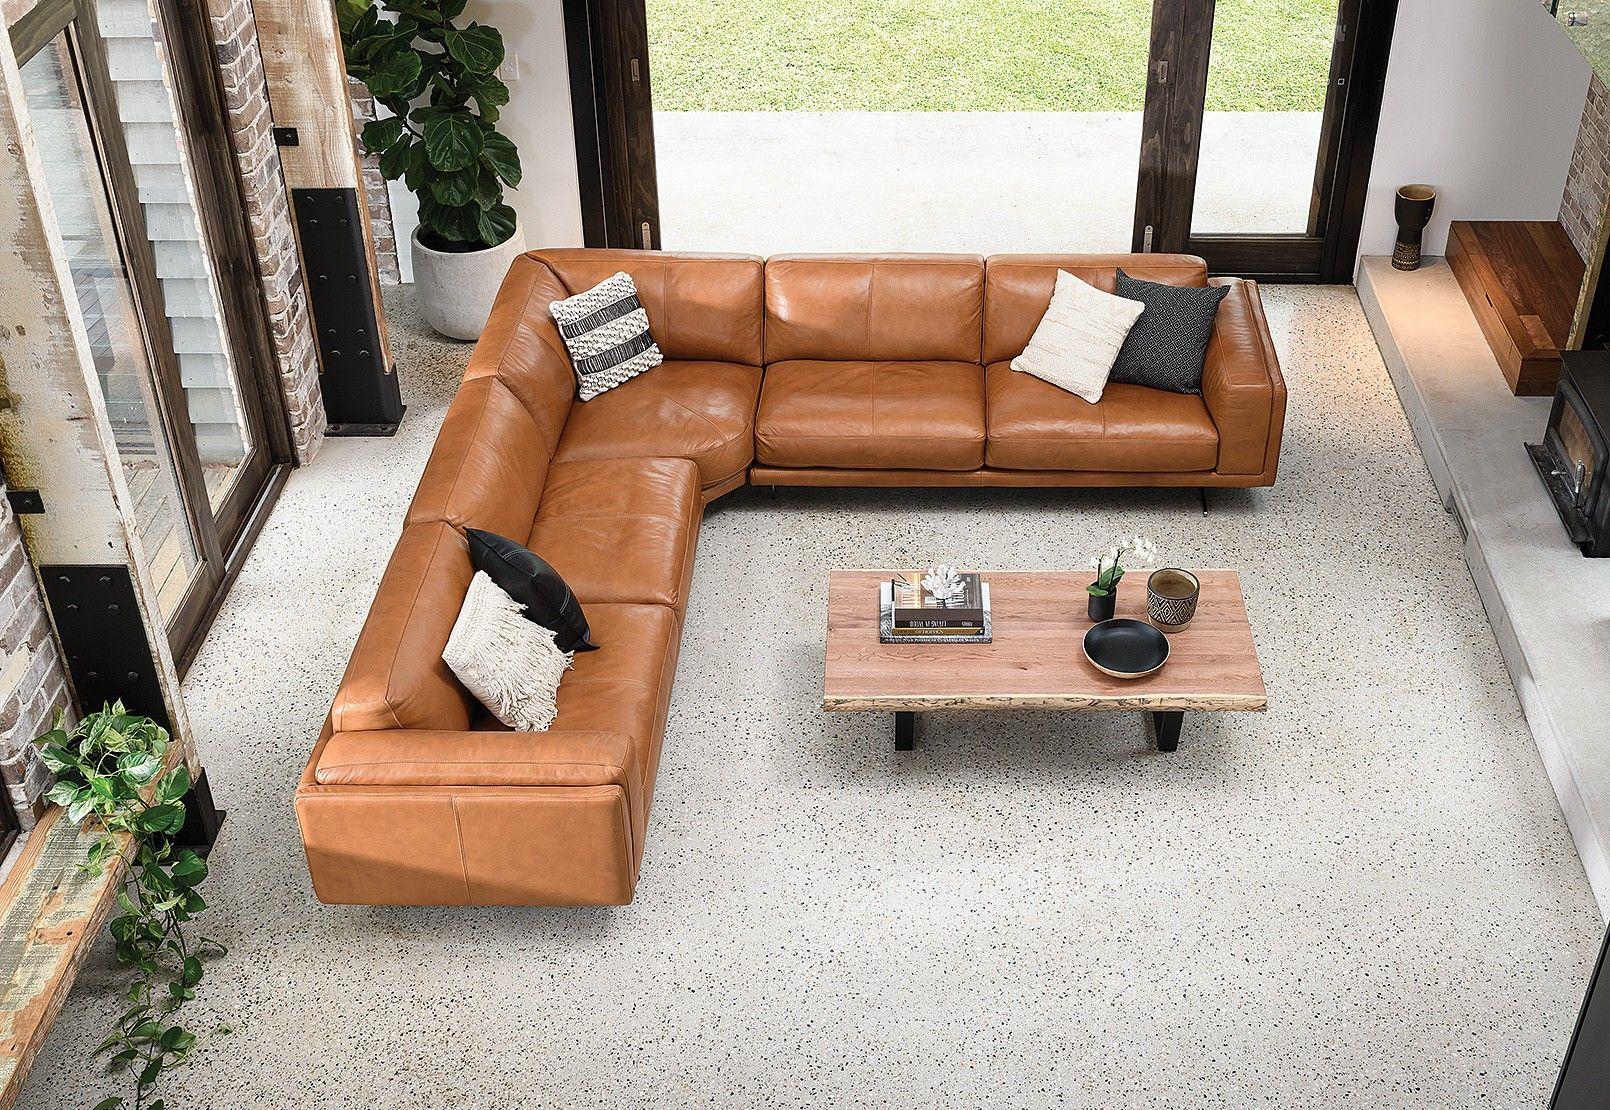 Strange Alessandra Leather Corner Lounge Amart Furniture In 2019 Ibusinesslaw Wood Chair Design Ideas Ibusinesslaworg